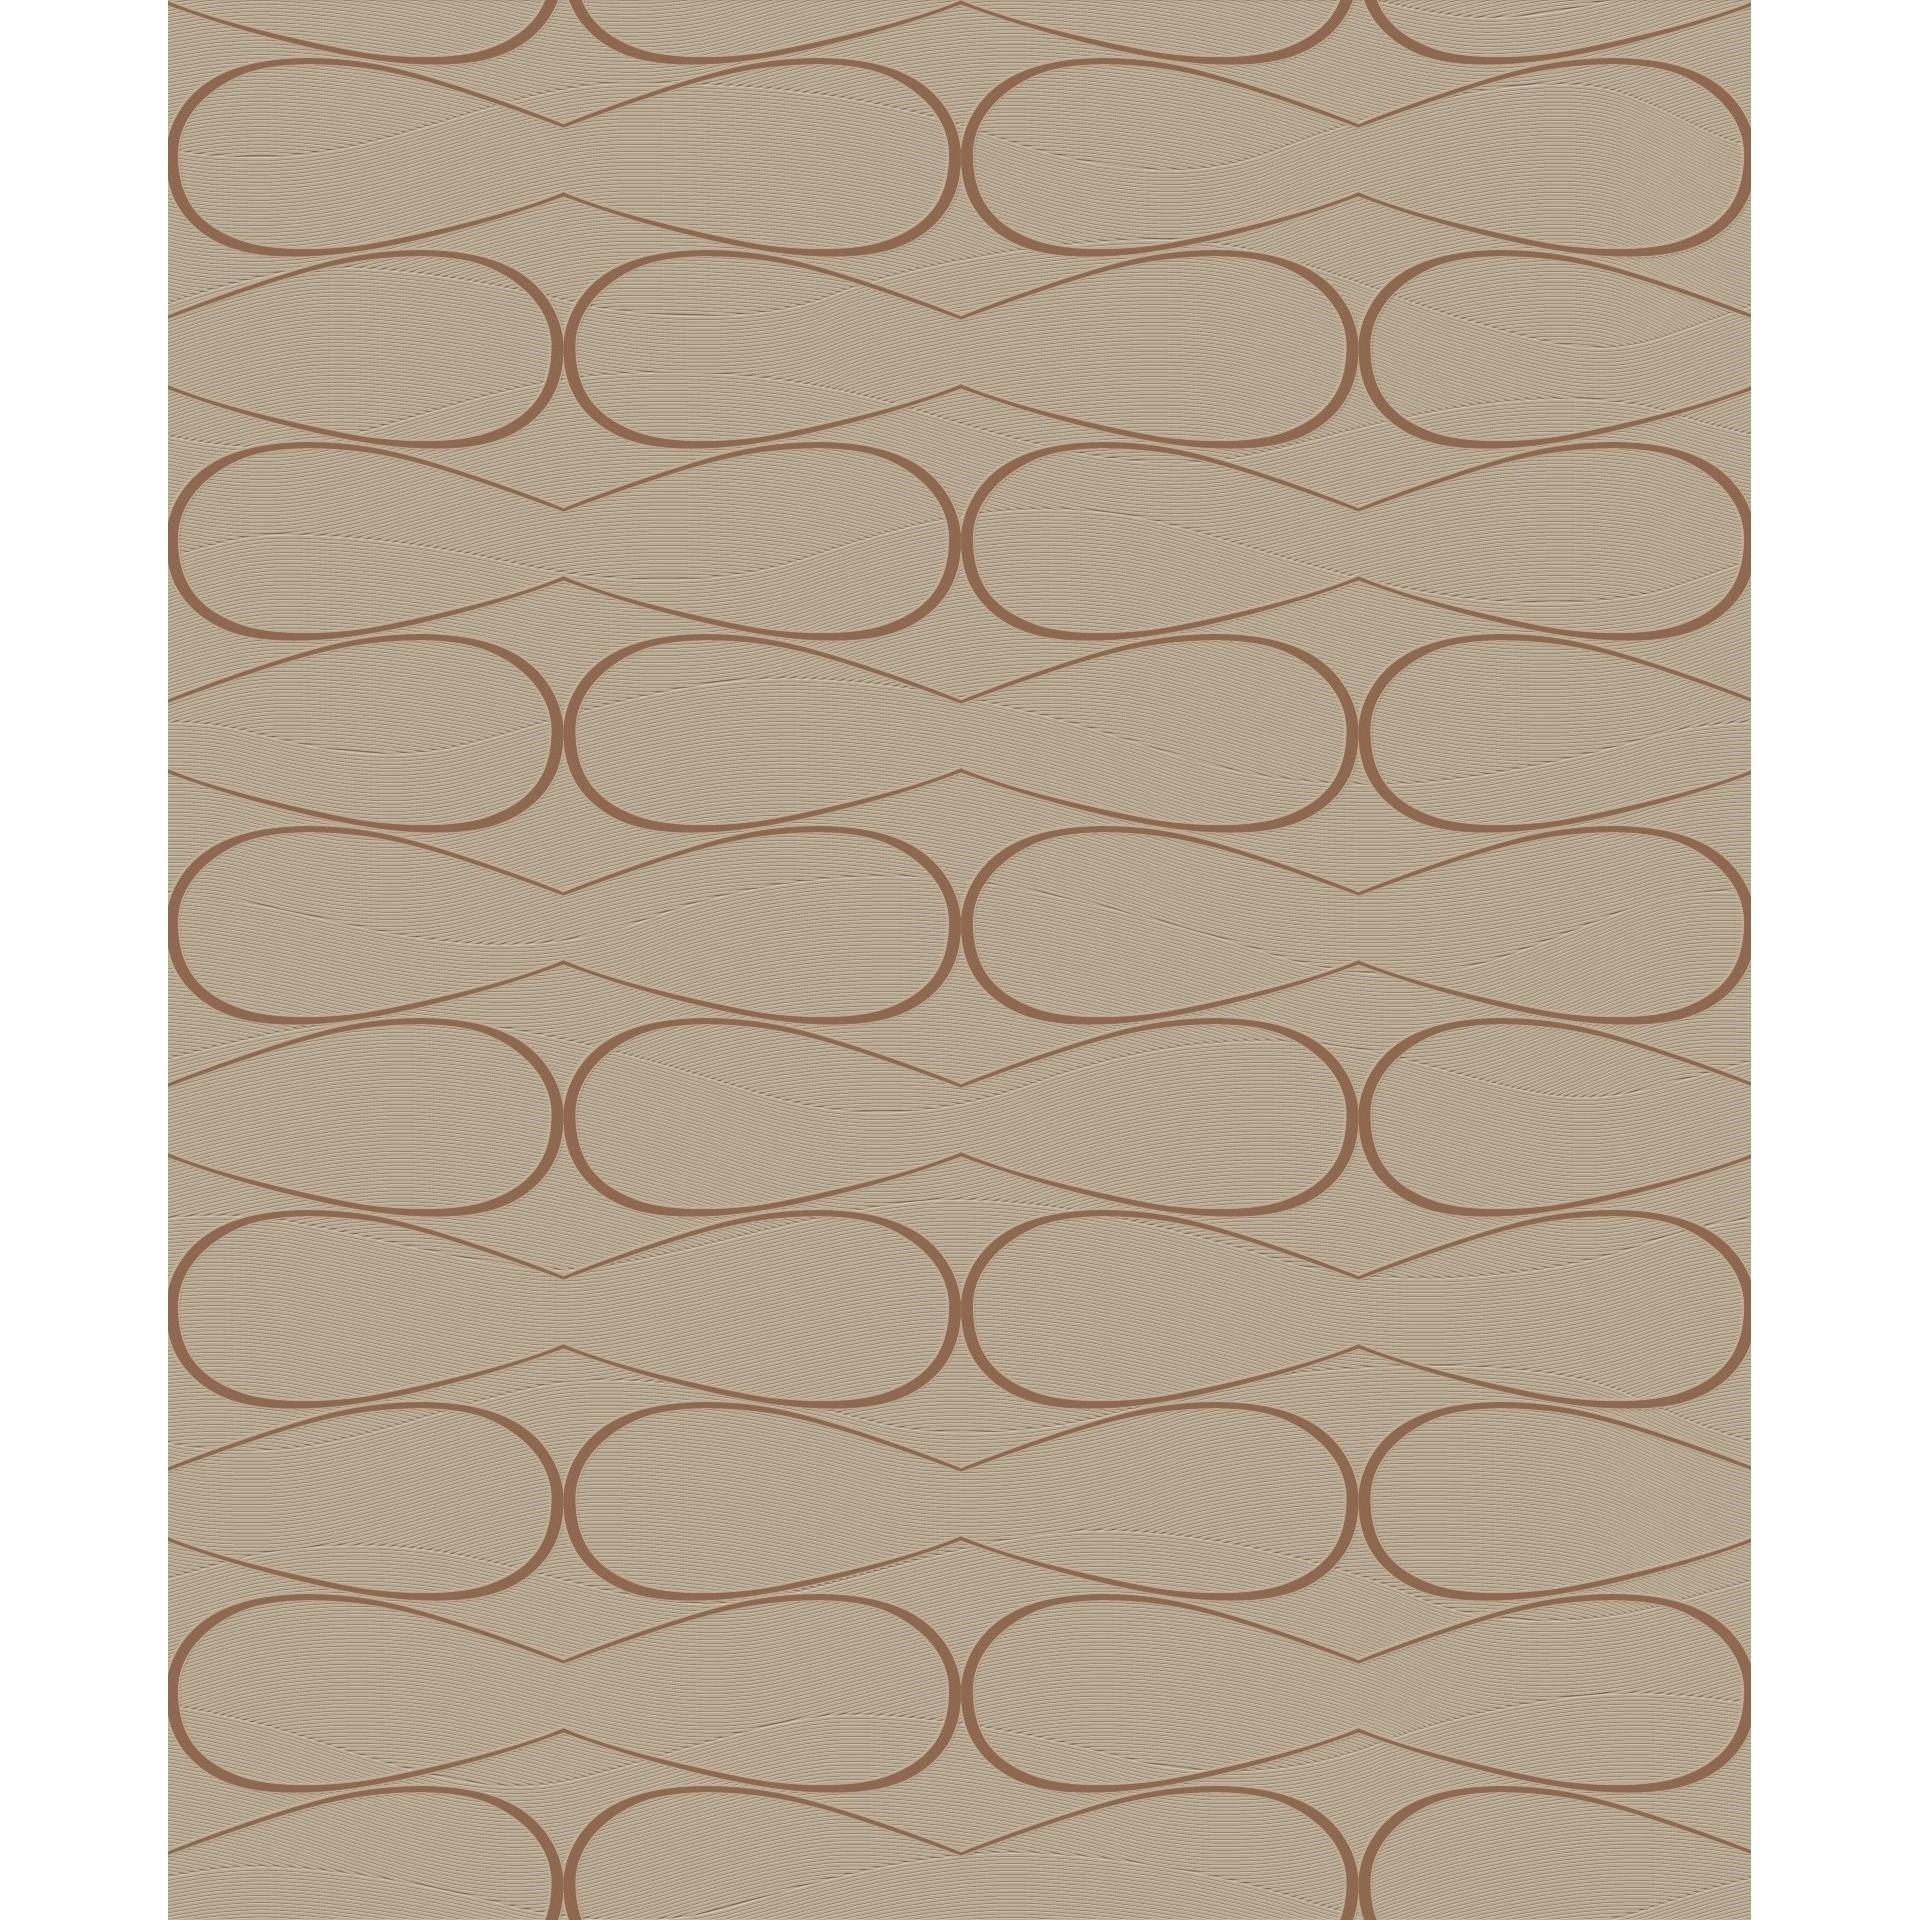 Papel de Parede 53cm x 10m Nonwoven Texturizado Roma 1201 - Jolie